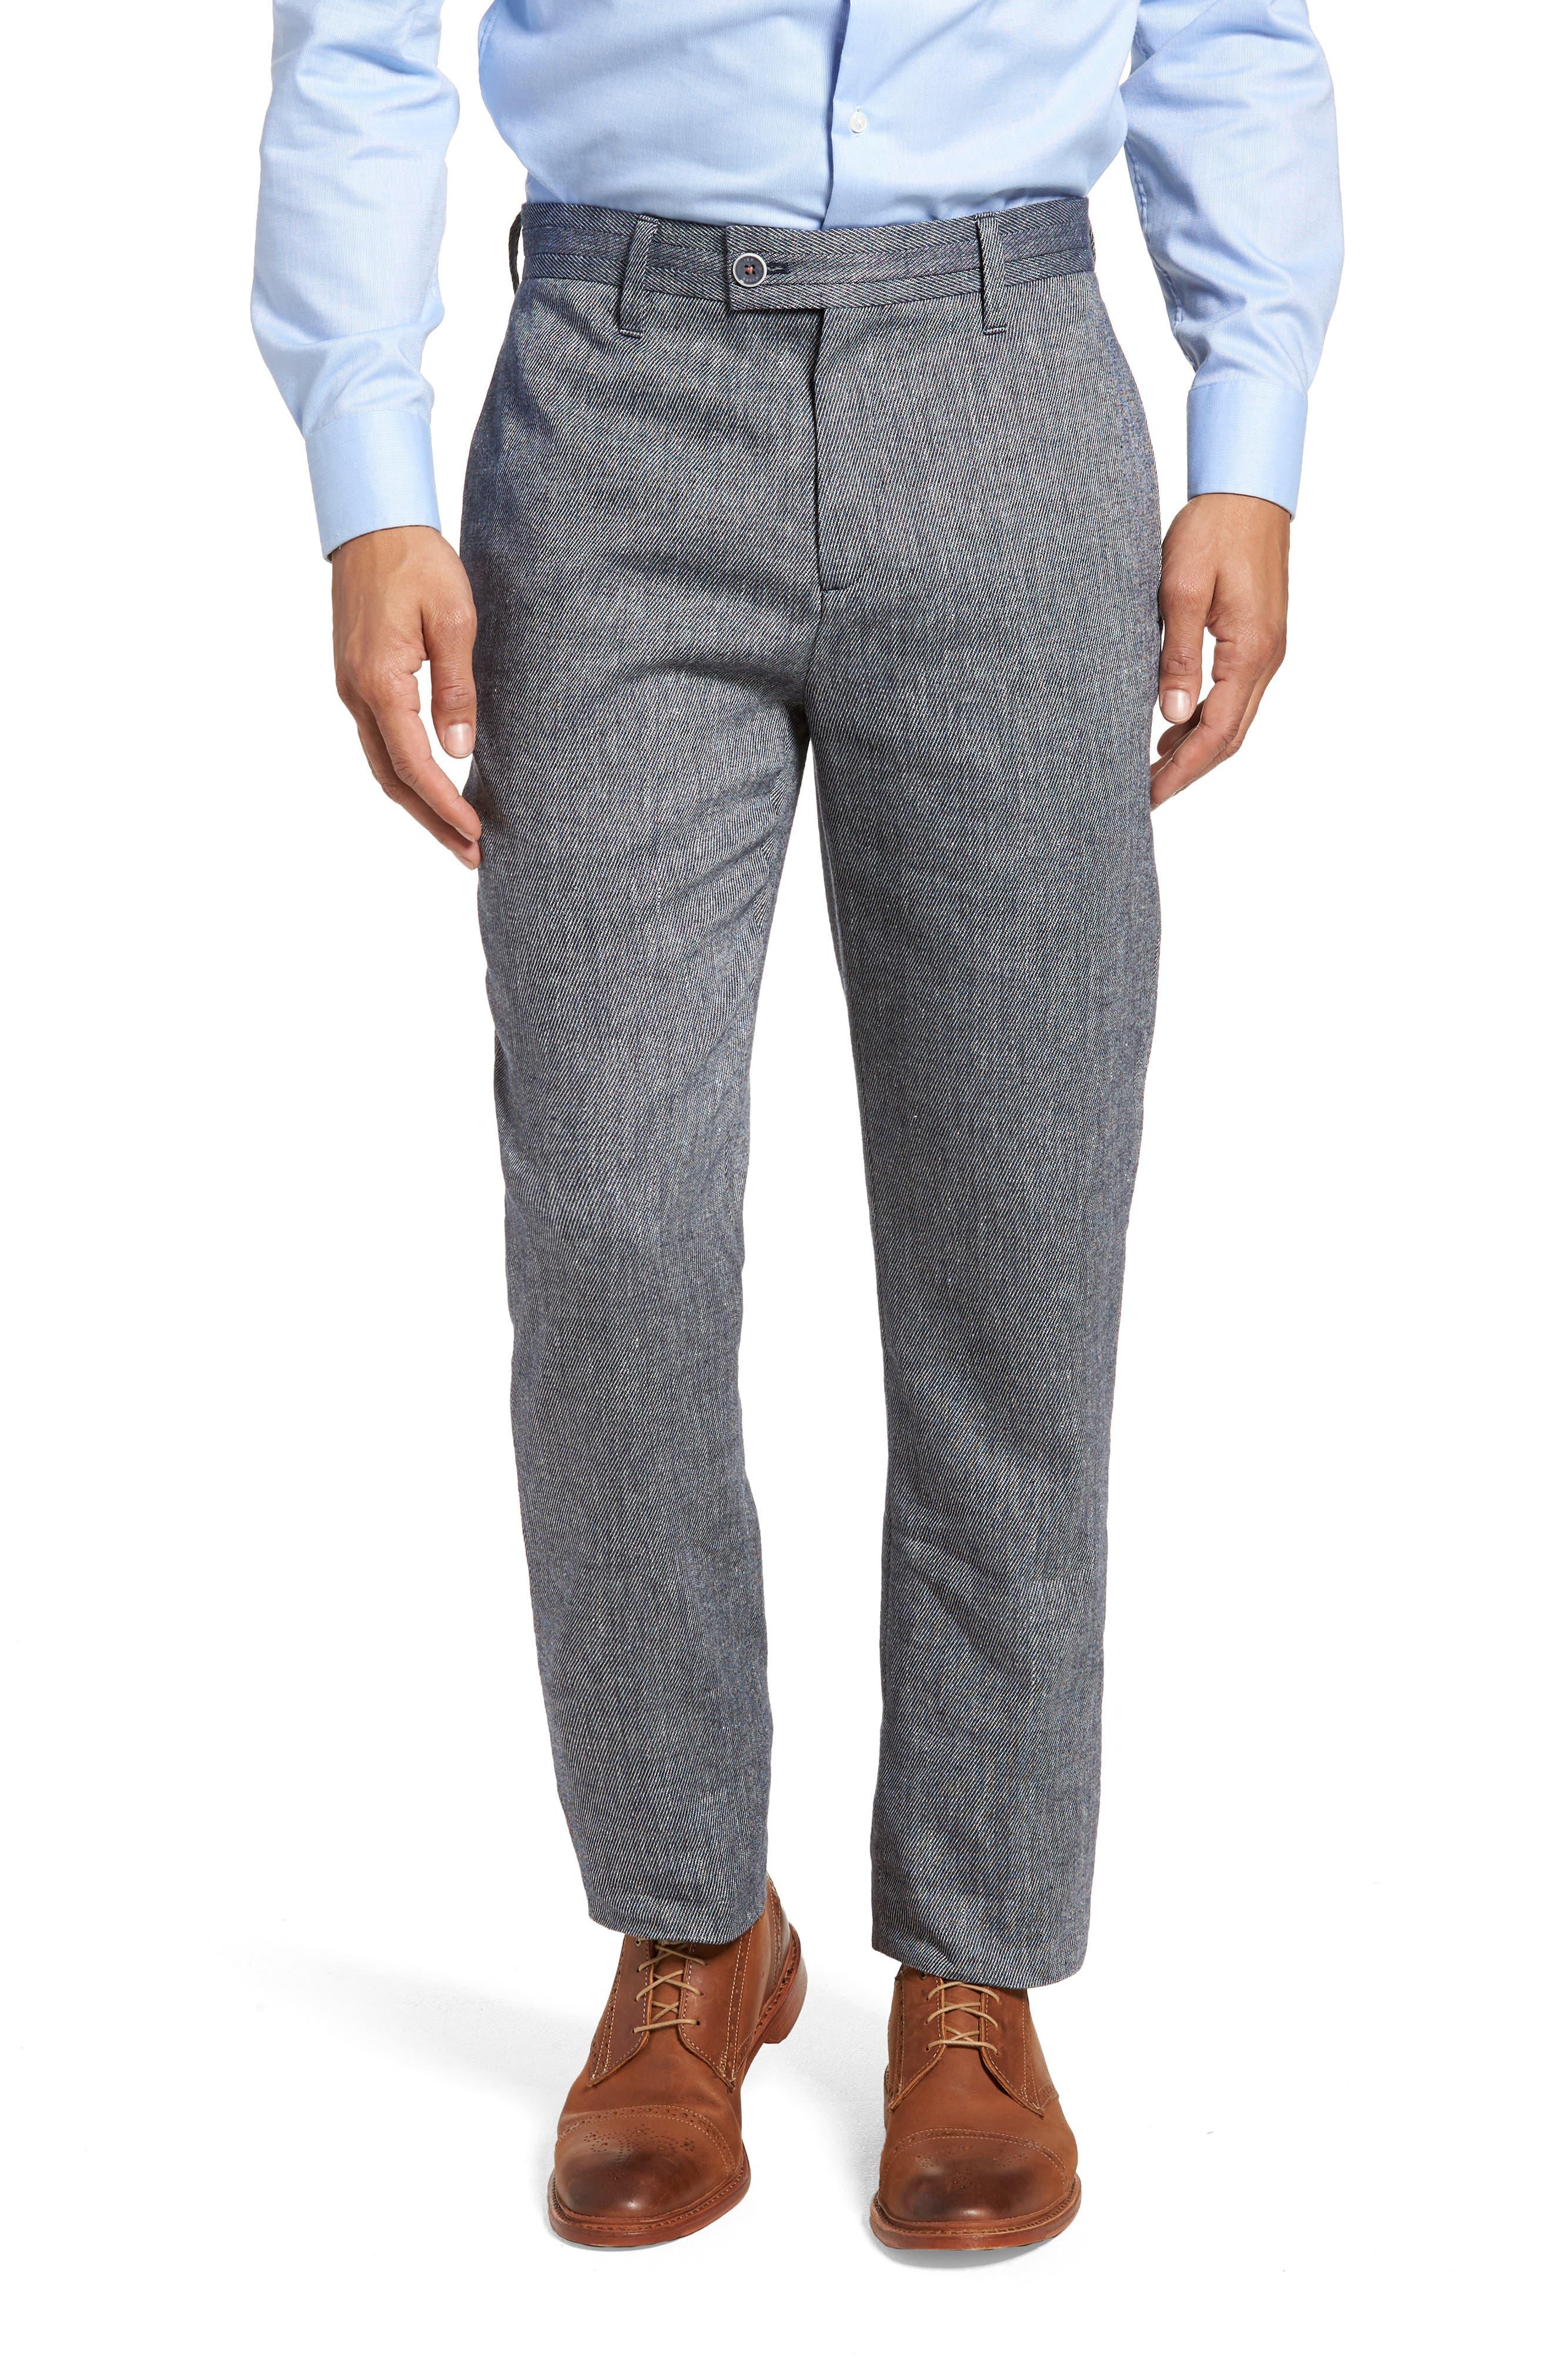 Clifrot Trim Fit Trousers,                             Main thumbnail 1, color,                             Blue